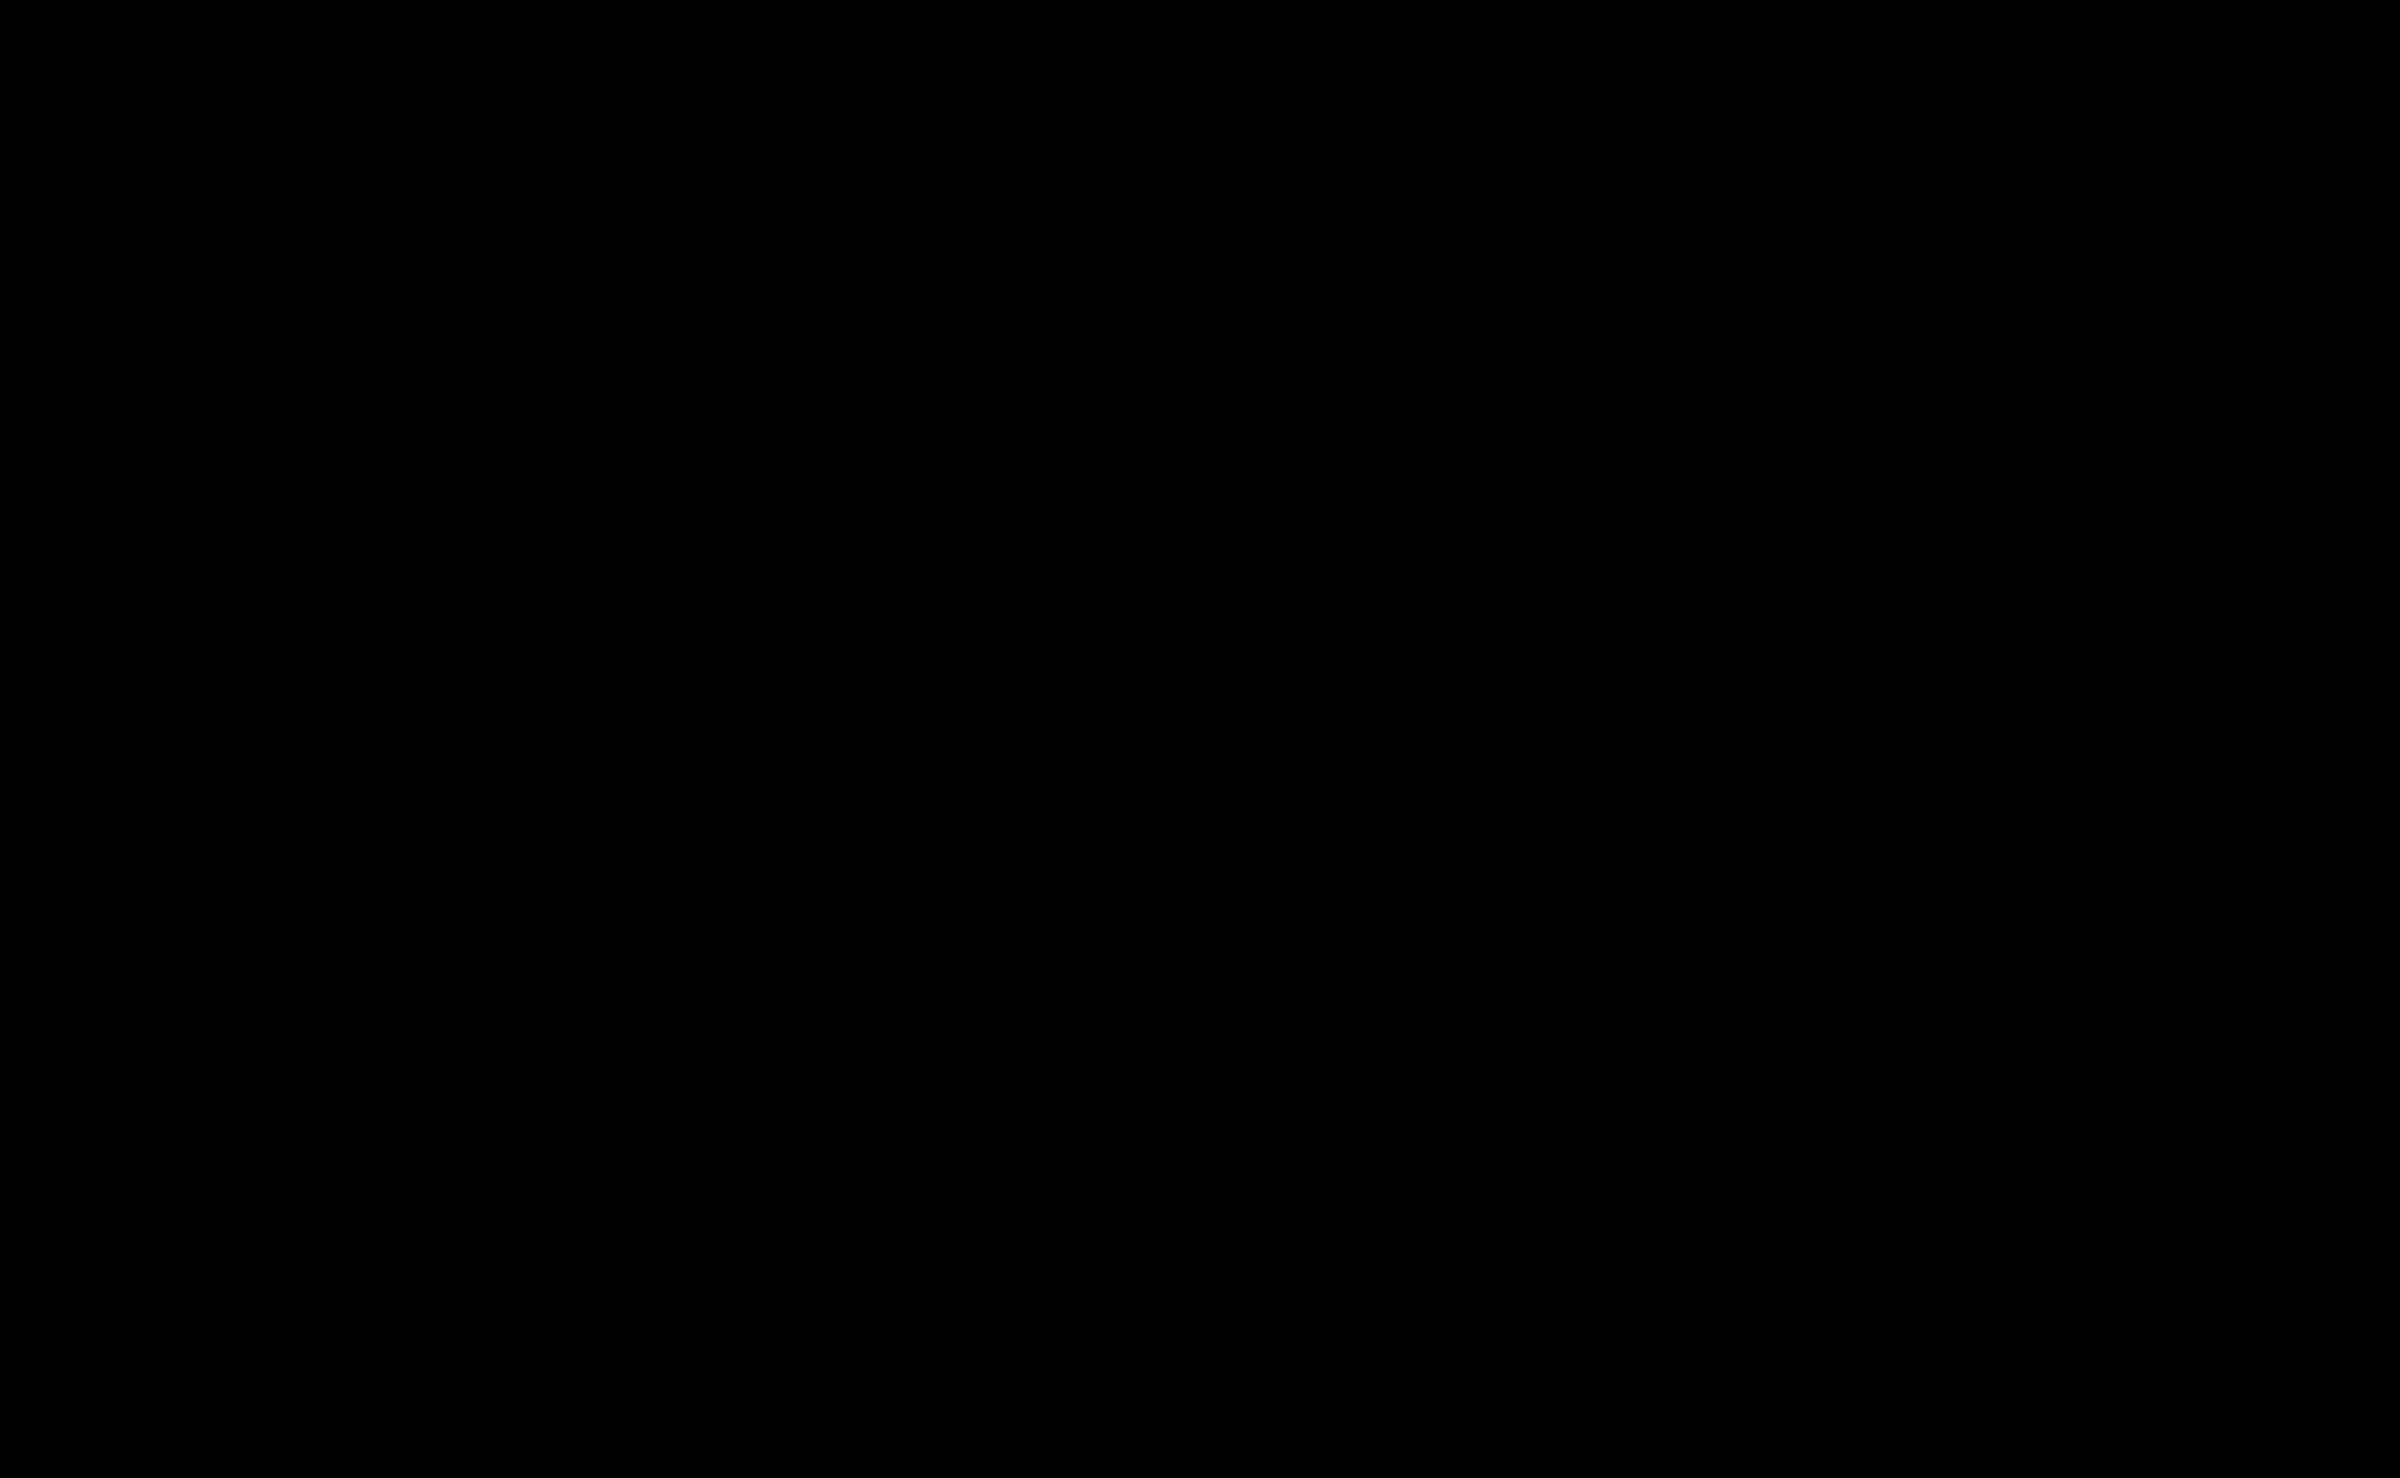 Clipart diamond geometric. Seamless curved pattern big